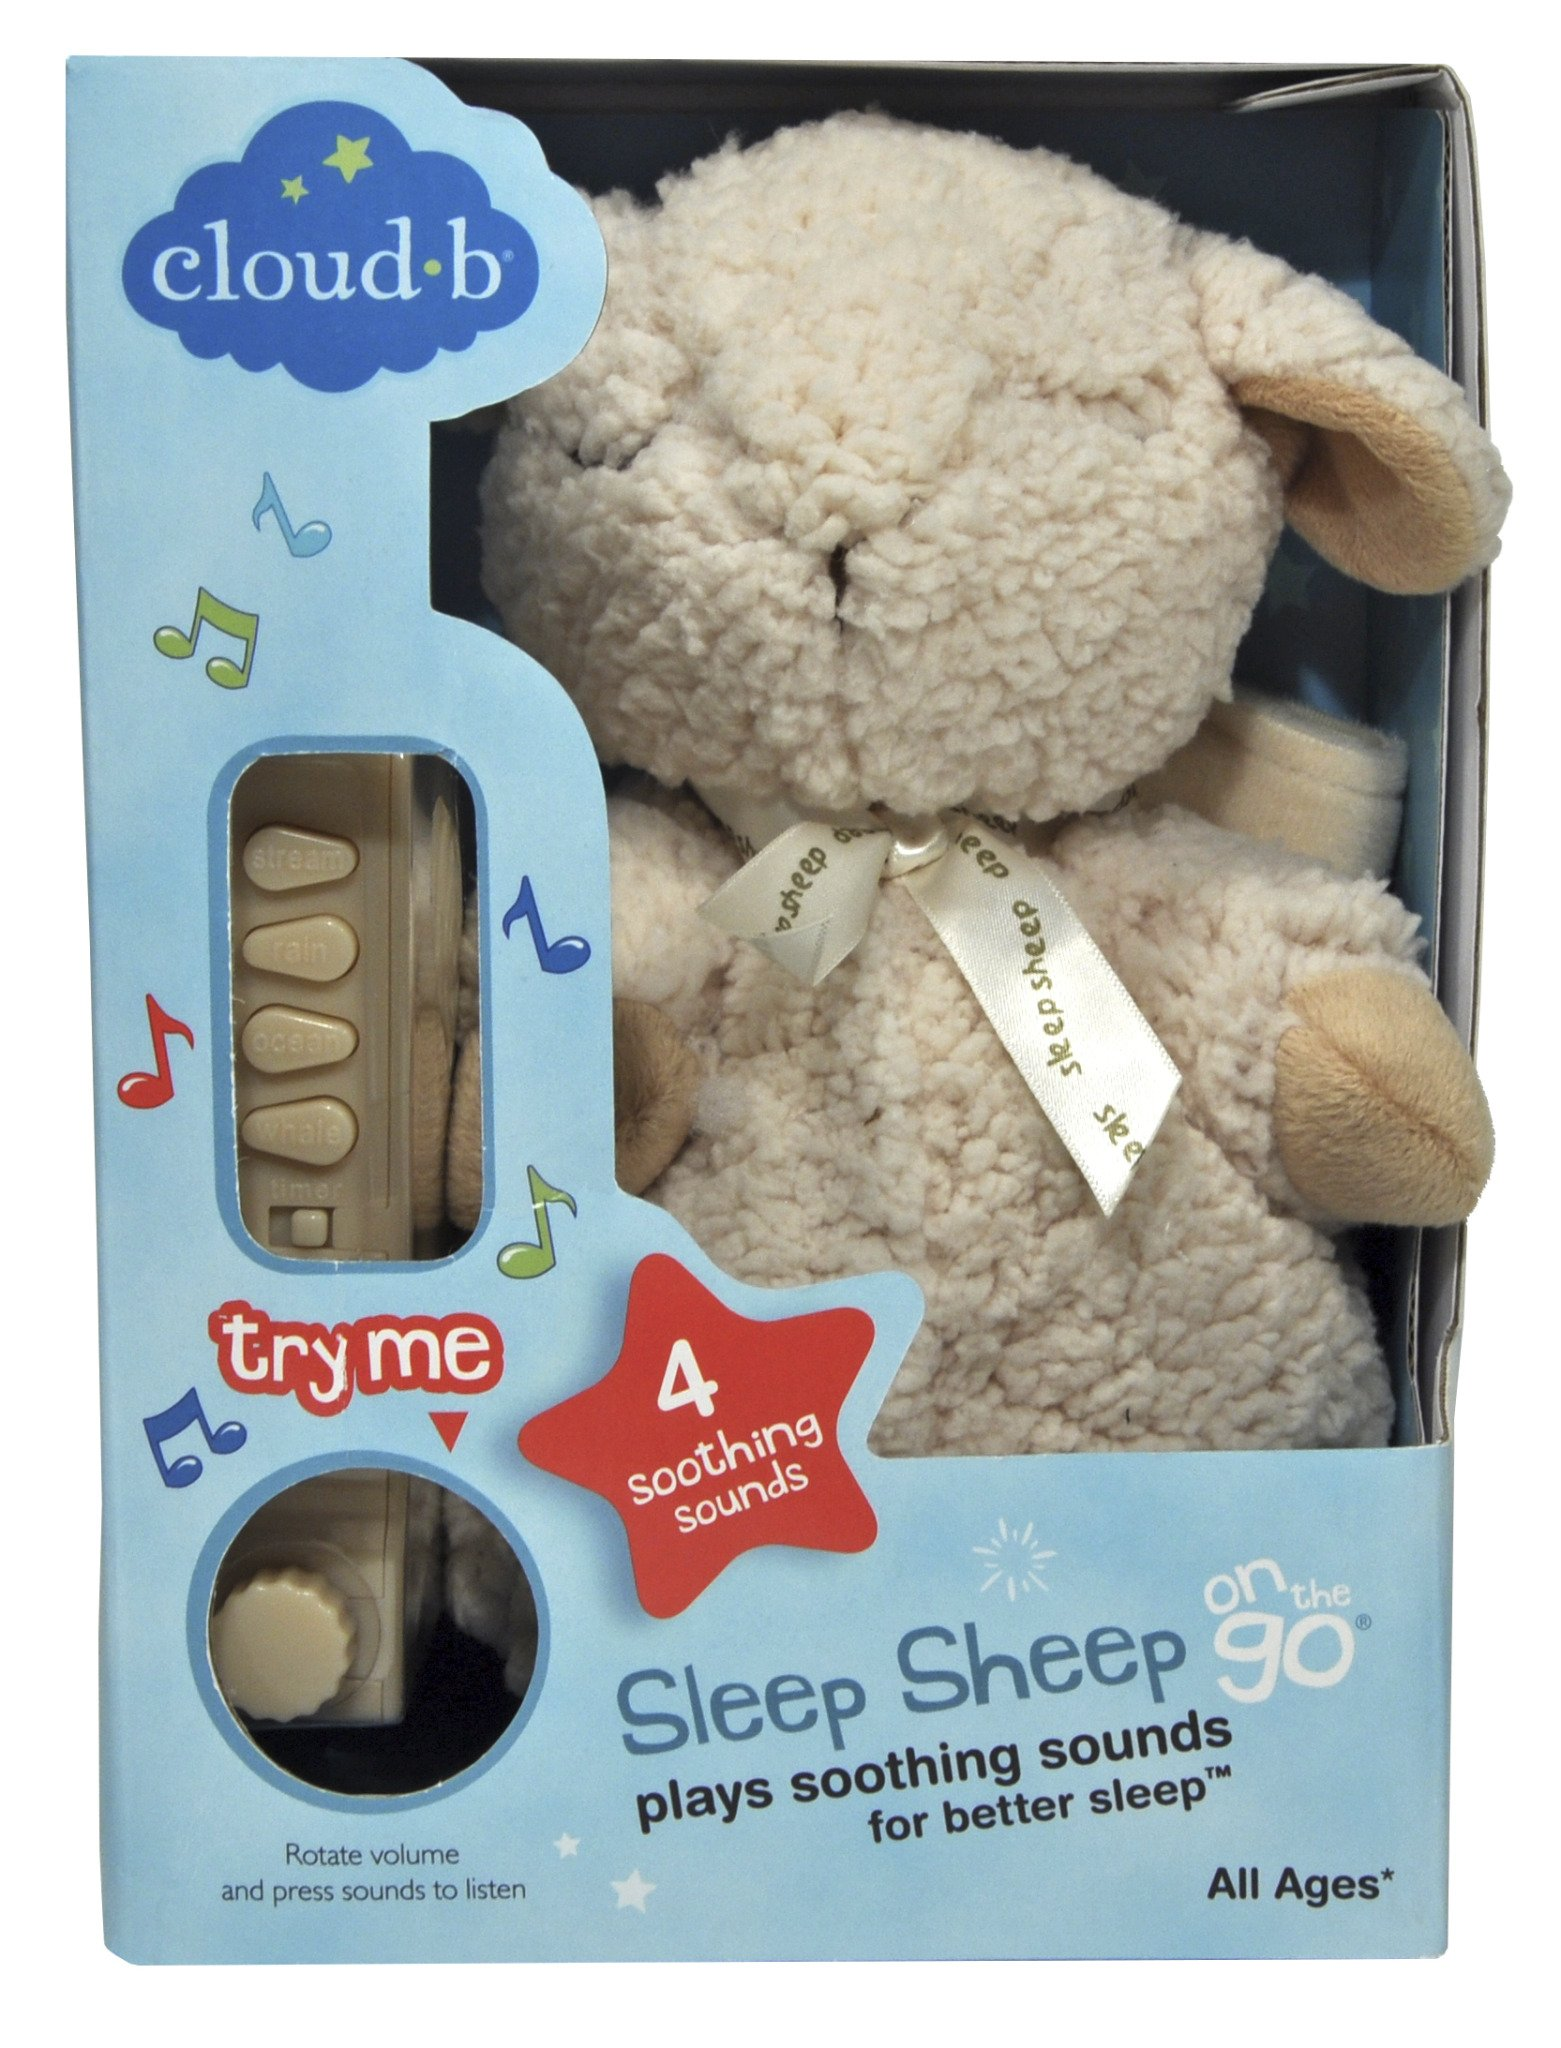 Cloud b Sleep Sheep On The Go Travel Sized White Noise Sound Machine by Cloud b (Image #6)